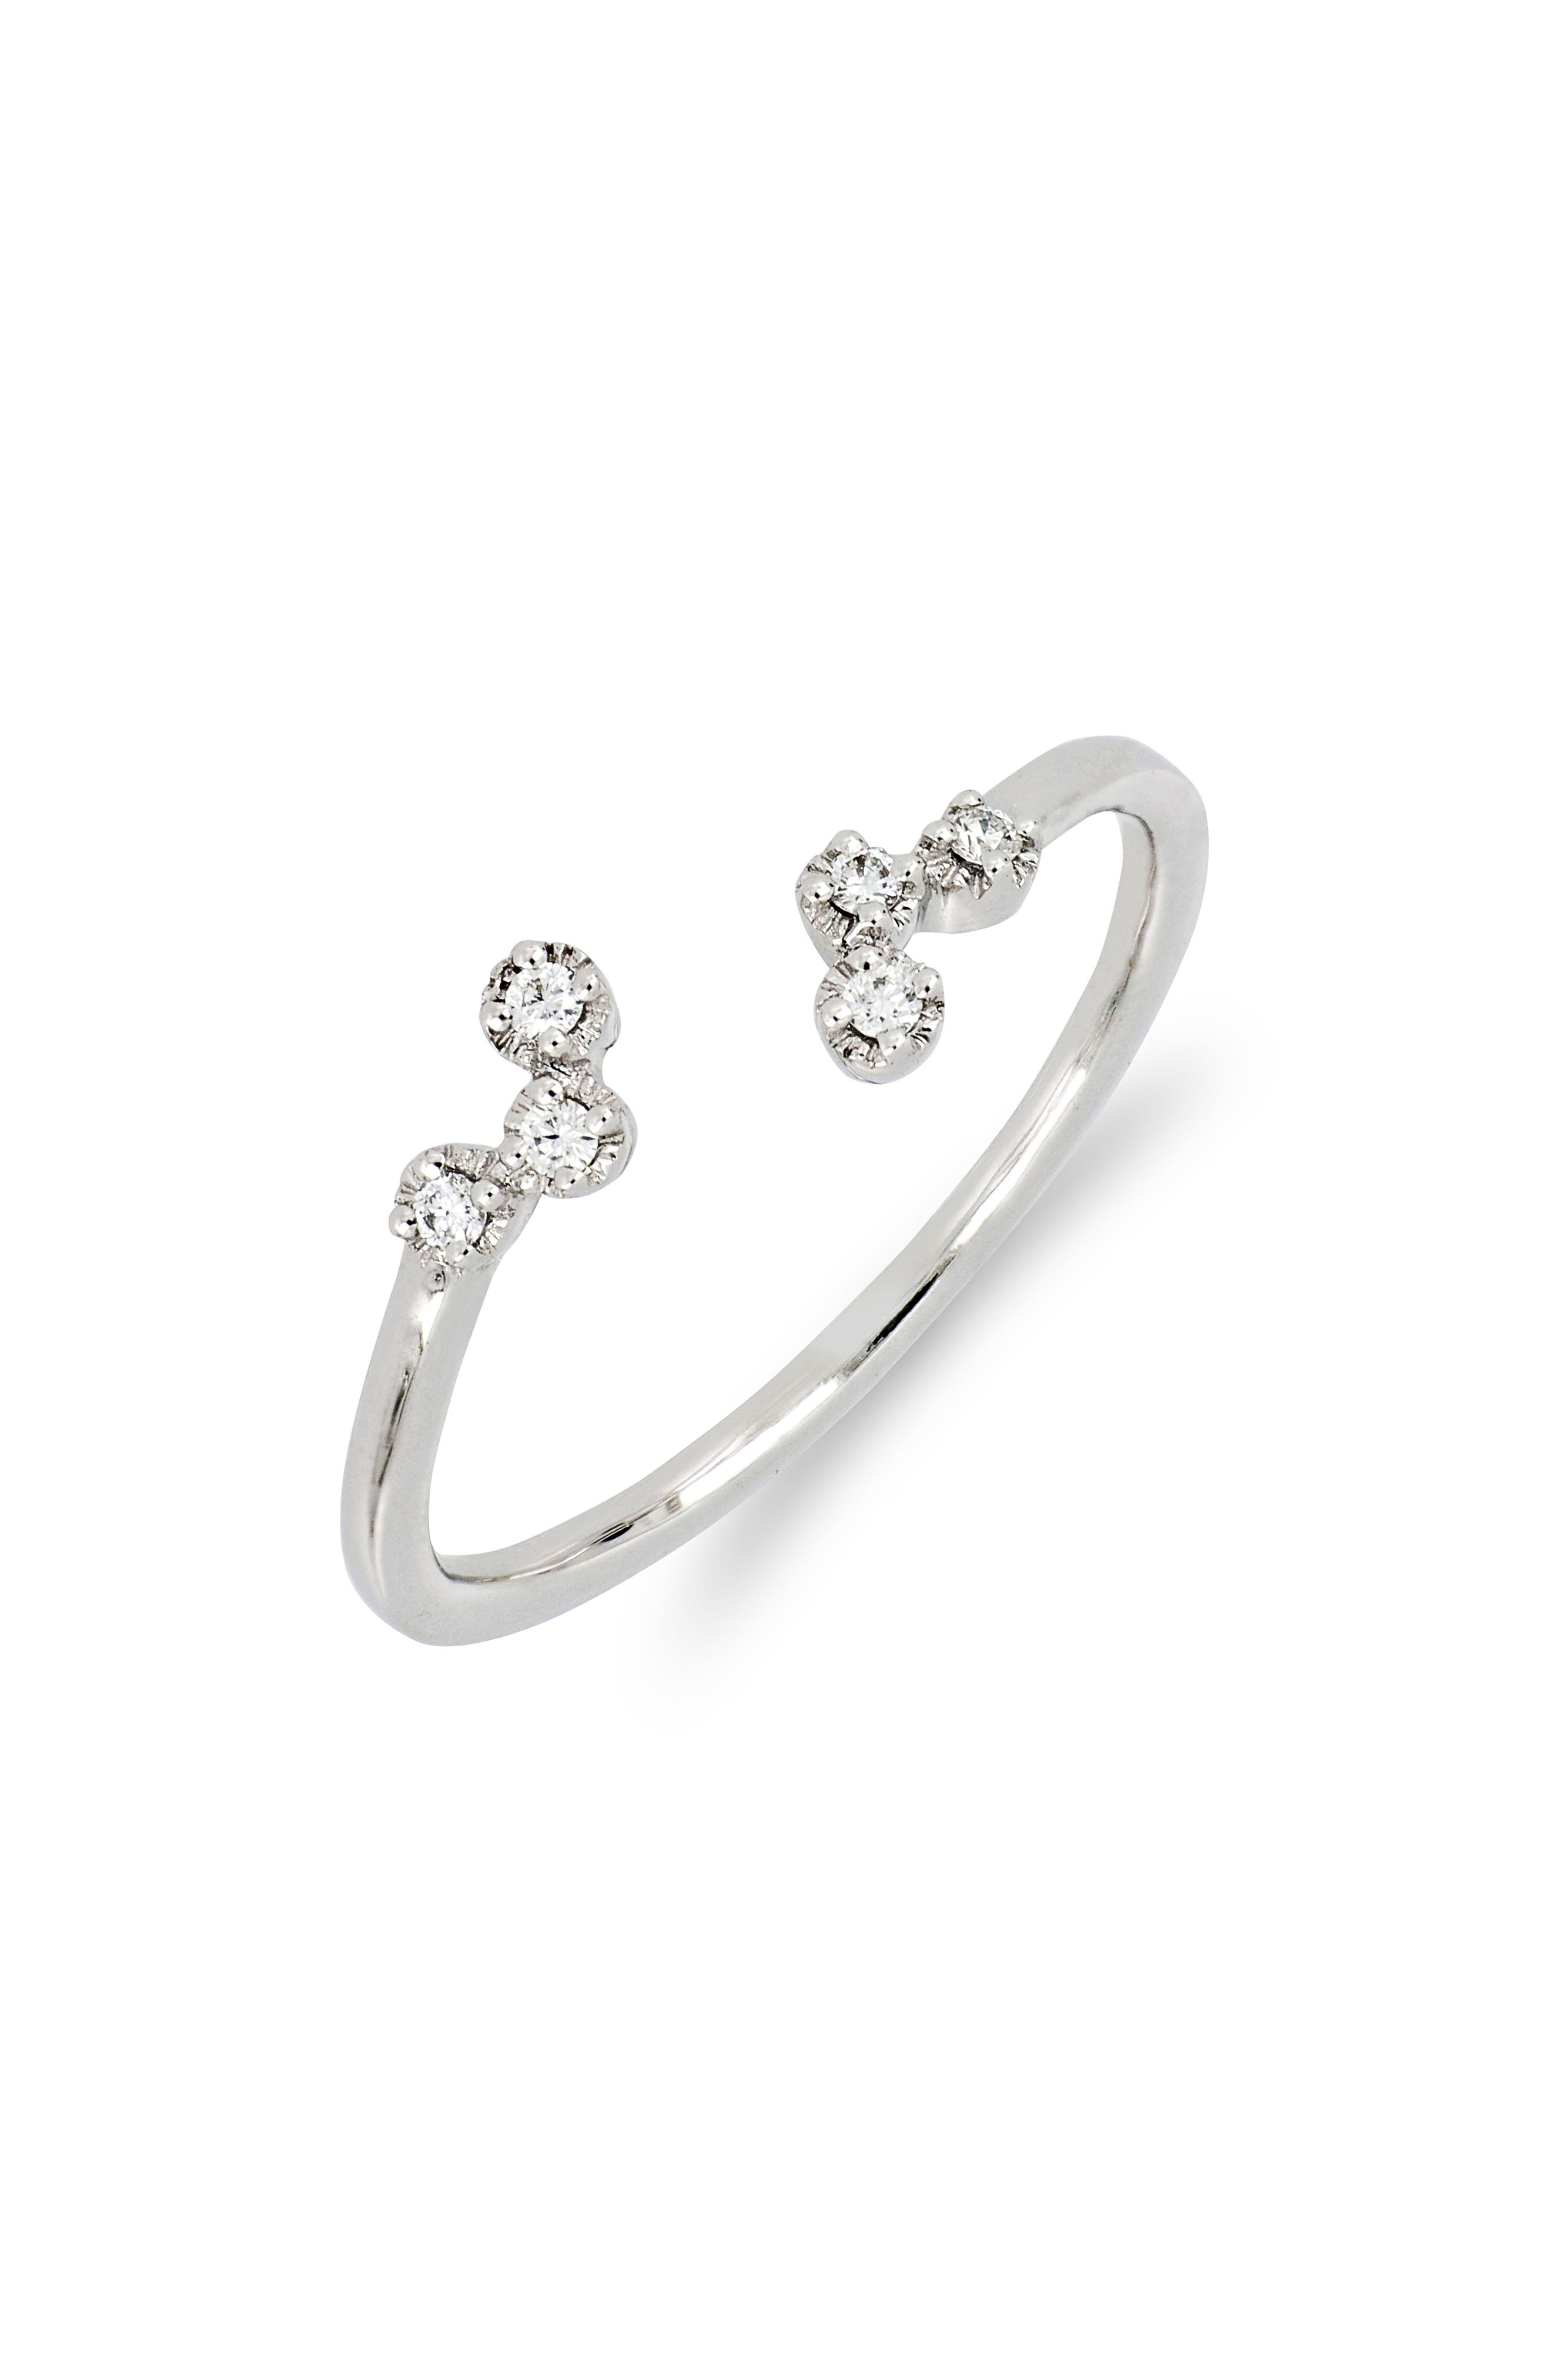 Mila Scattered Diamond Open Ring,                             Main thumbnail 1, color,                             WHITE GOLD